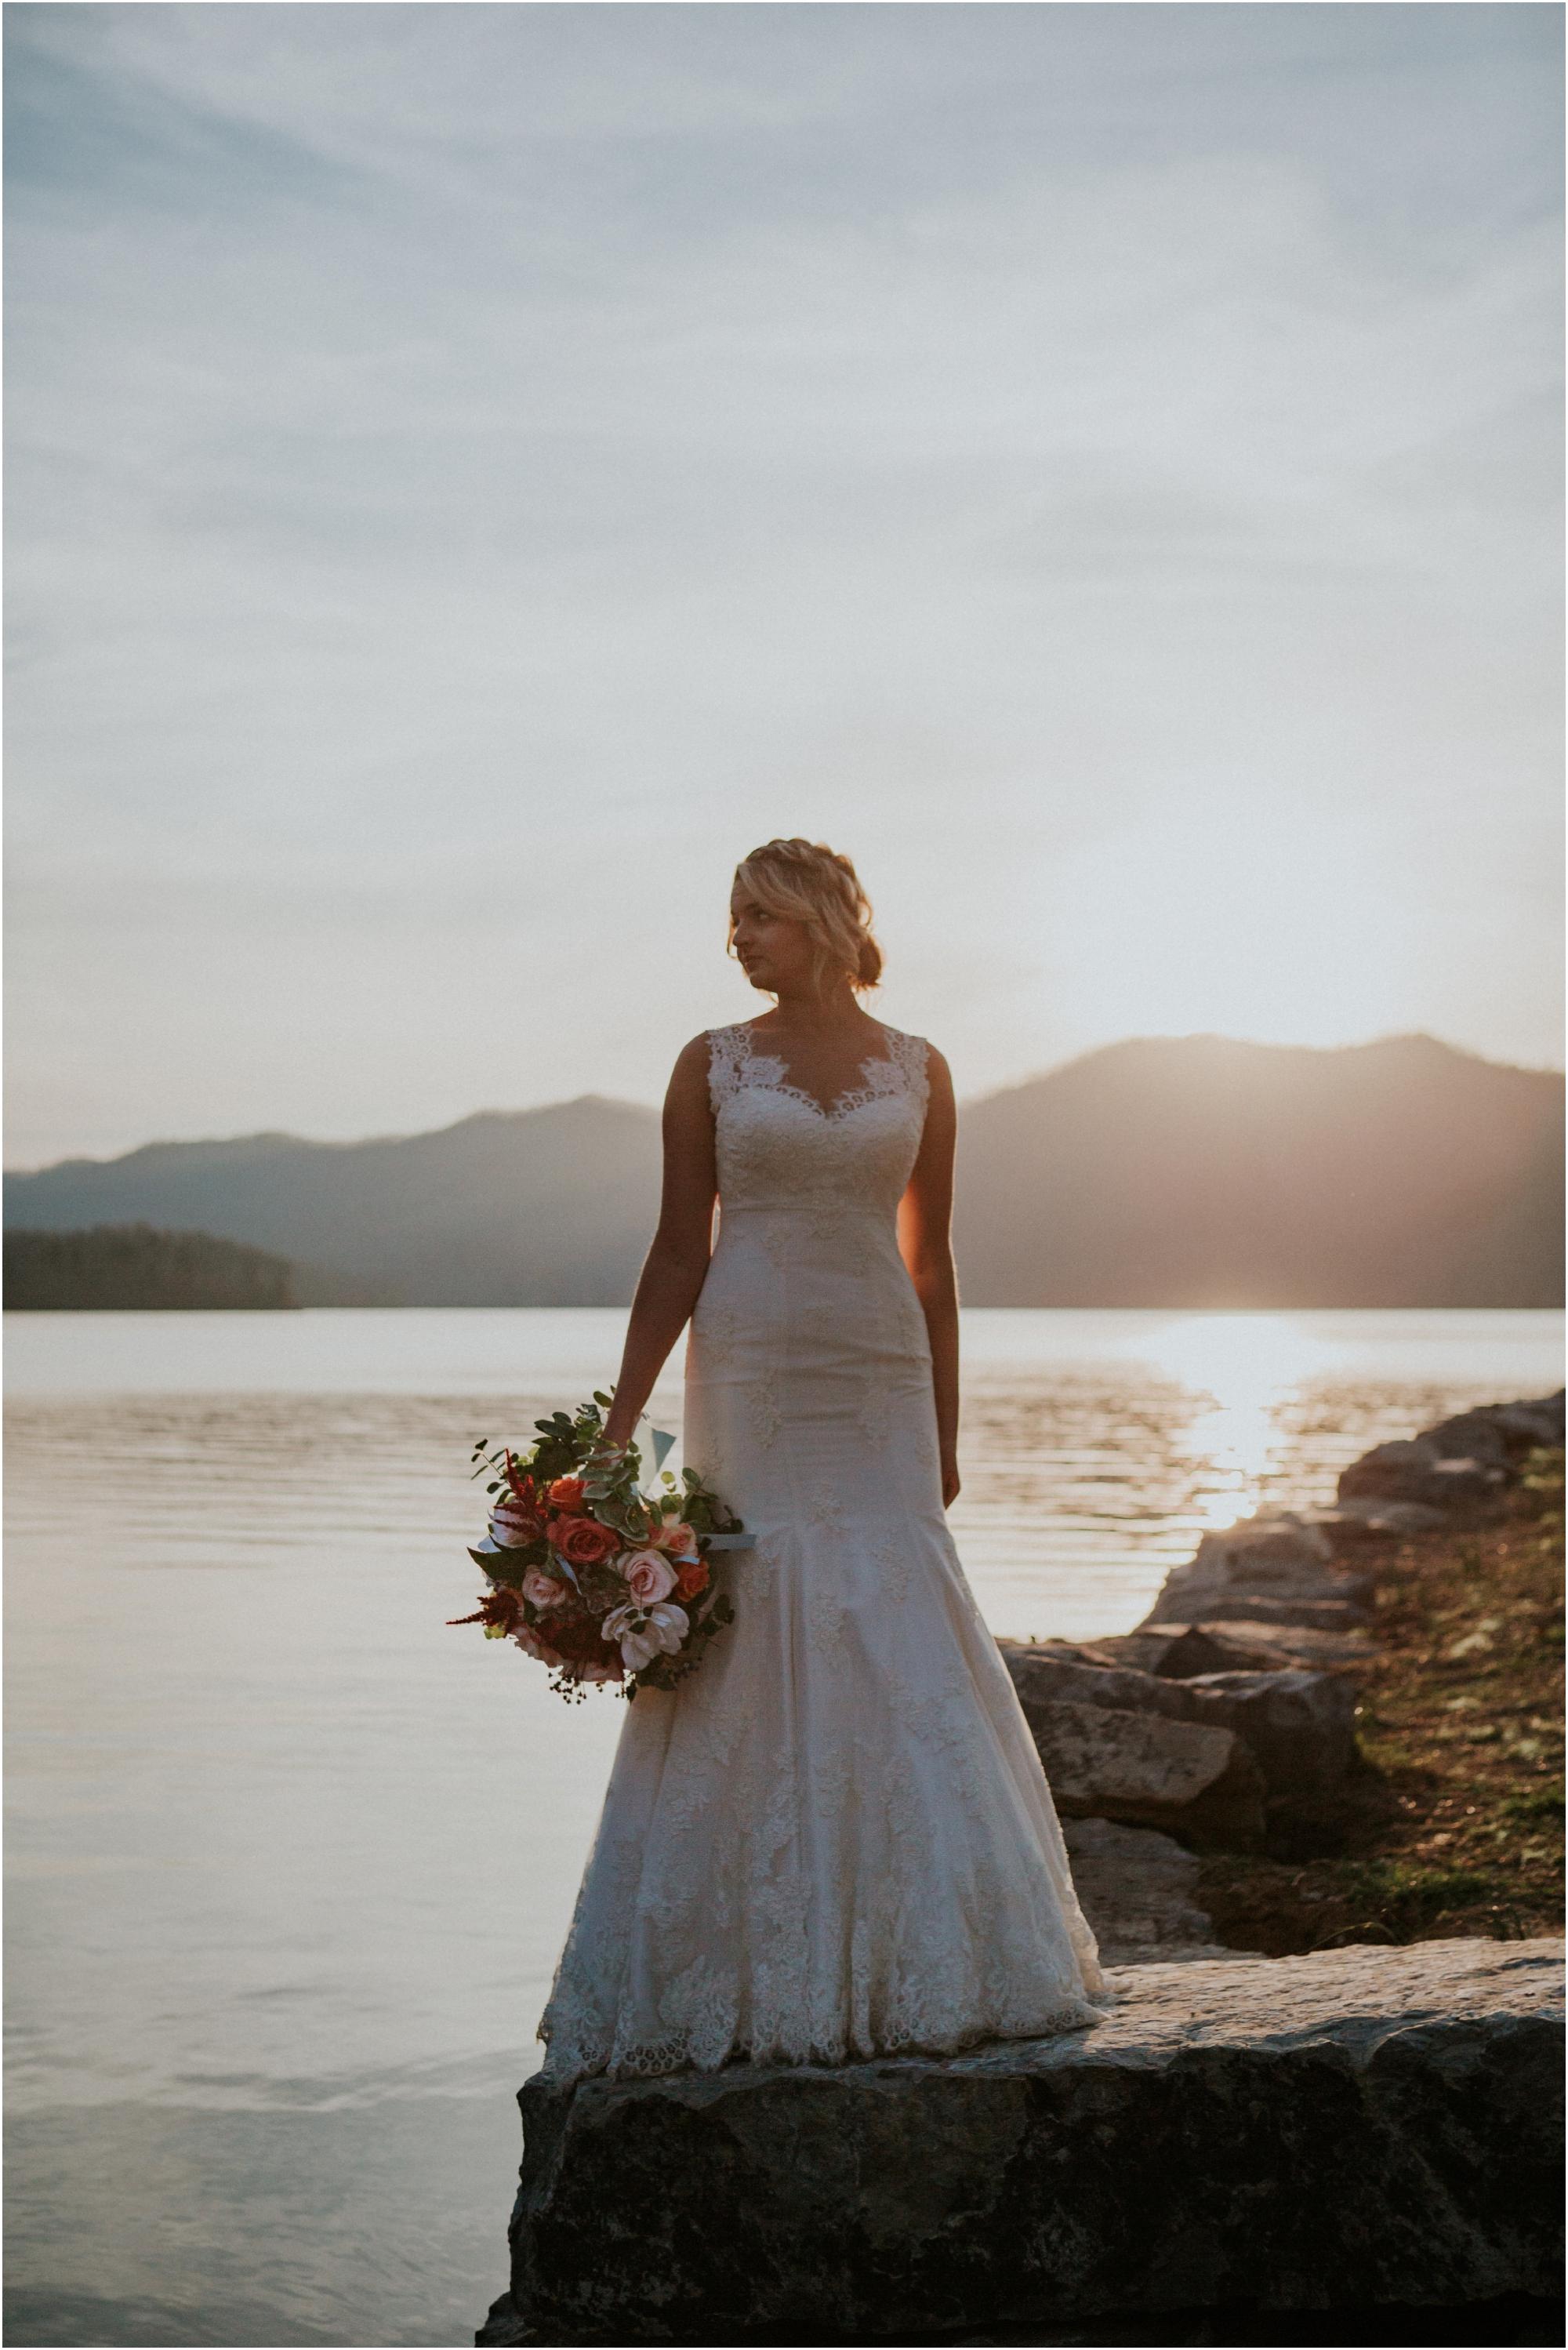 watauga-lake--bohemian-bridal-styled-session-northeast-tennessee-wedding-elopement-photography_0009.jpg